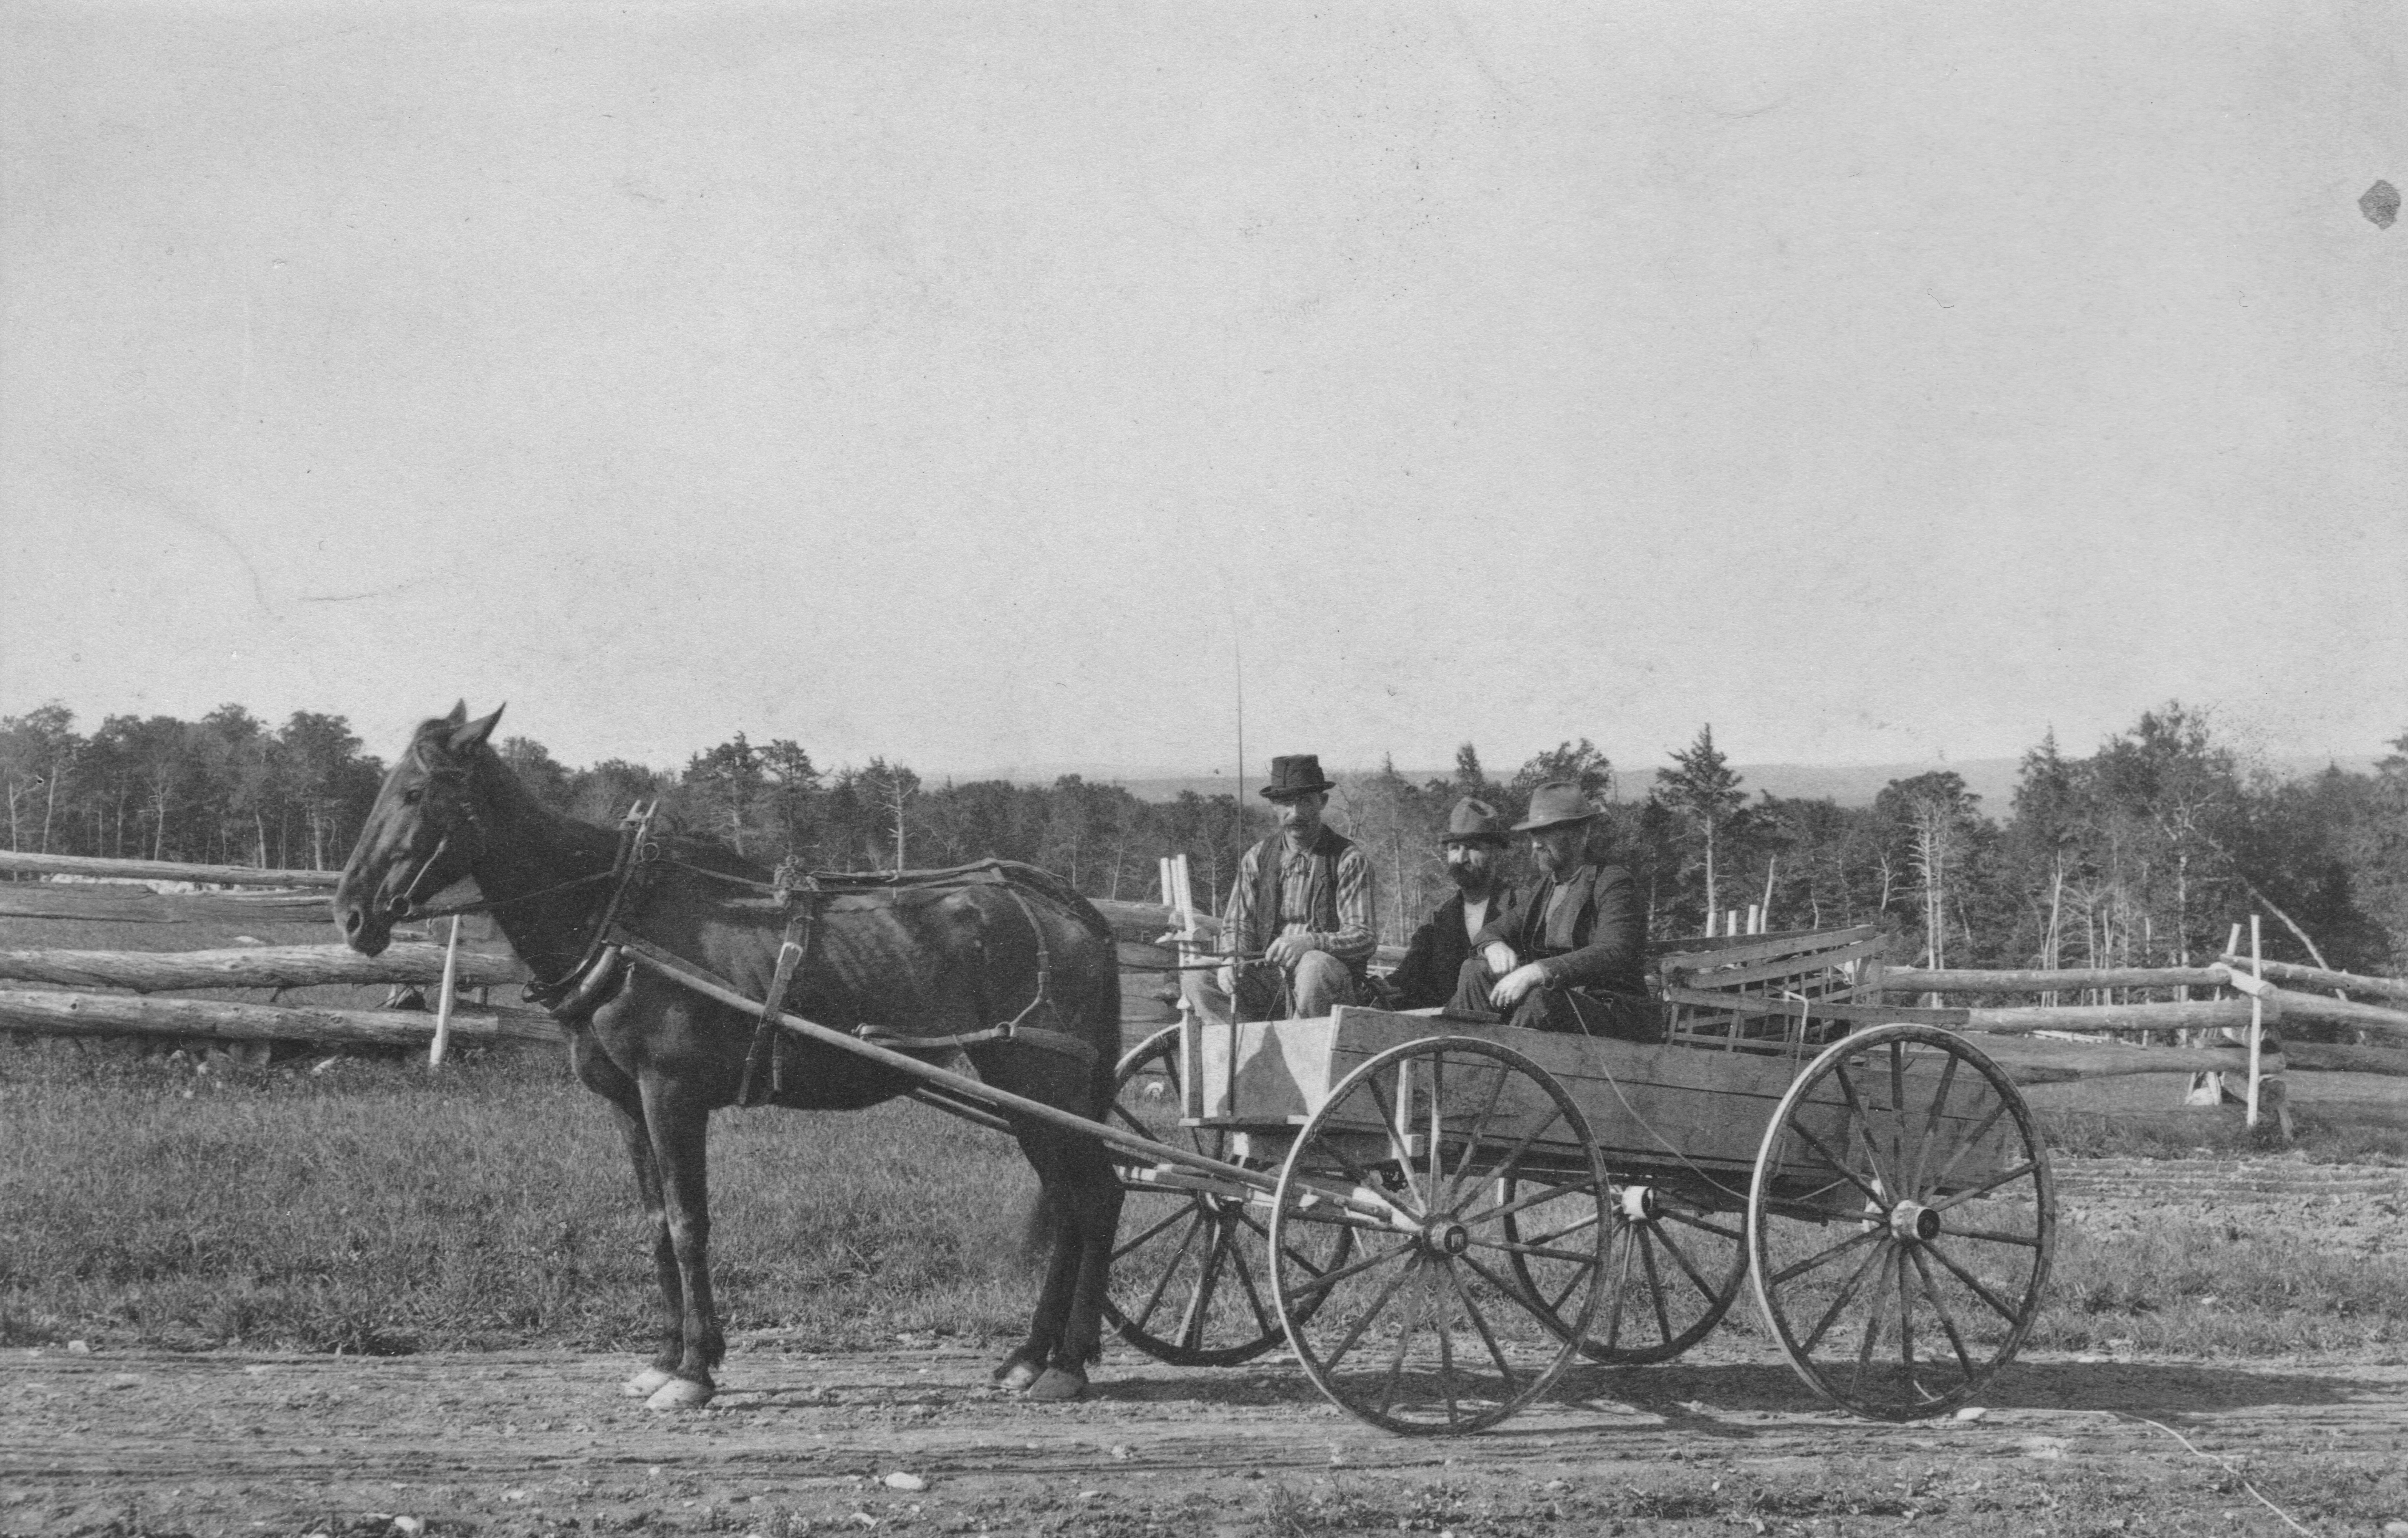 Walter Mansur, E.B. White and driver